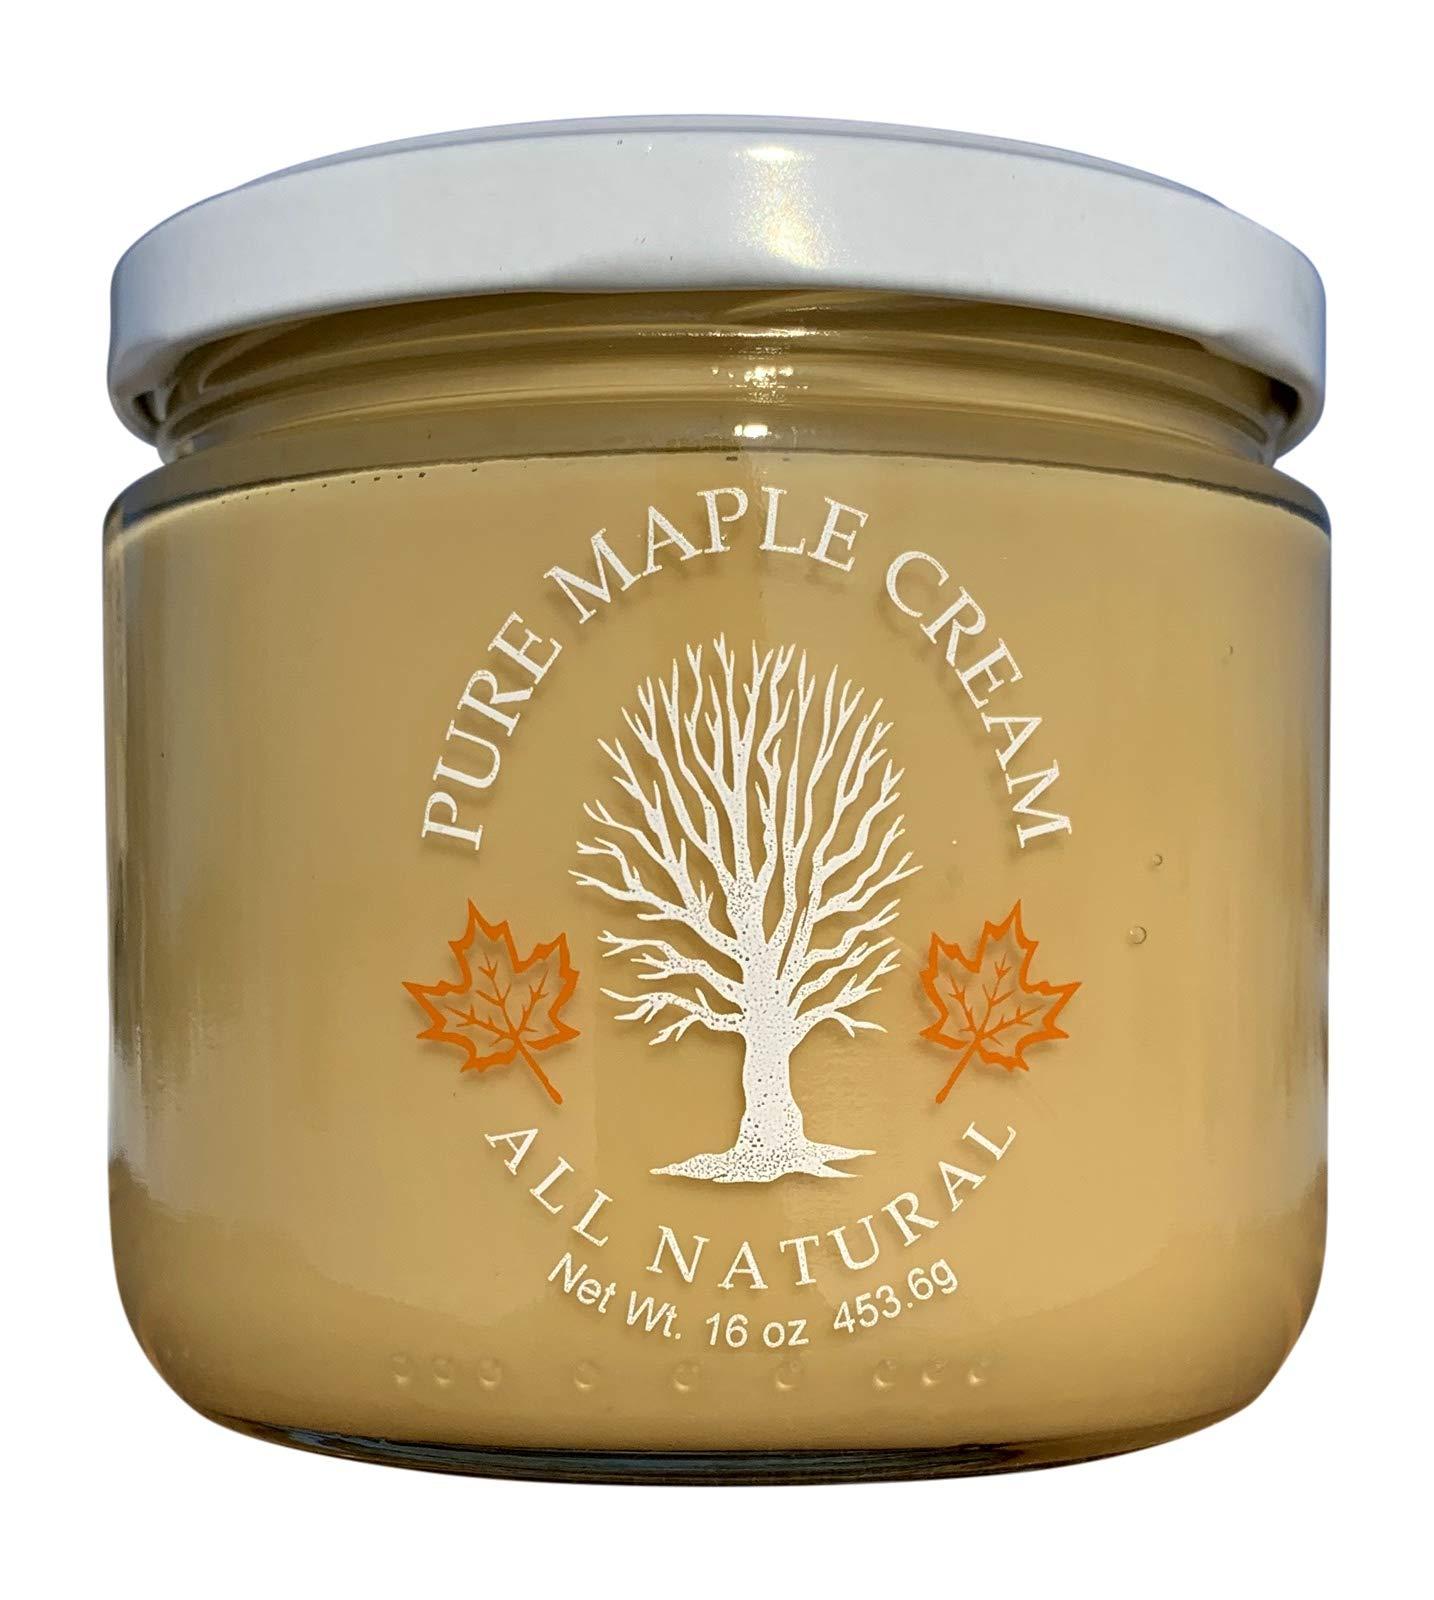 Pure Vermont Maple Cream (Rich & Smooth) 2020 production season is underway